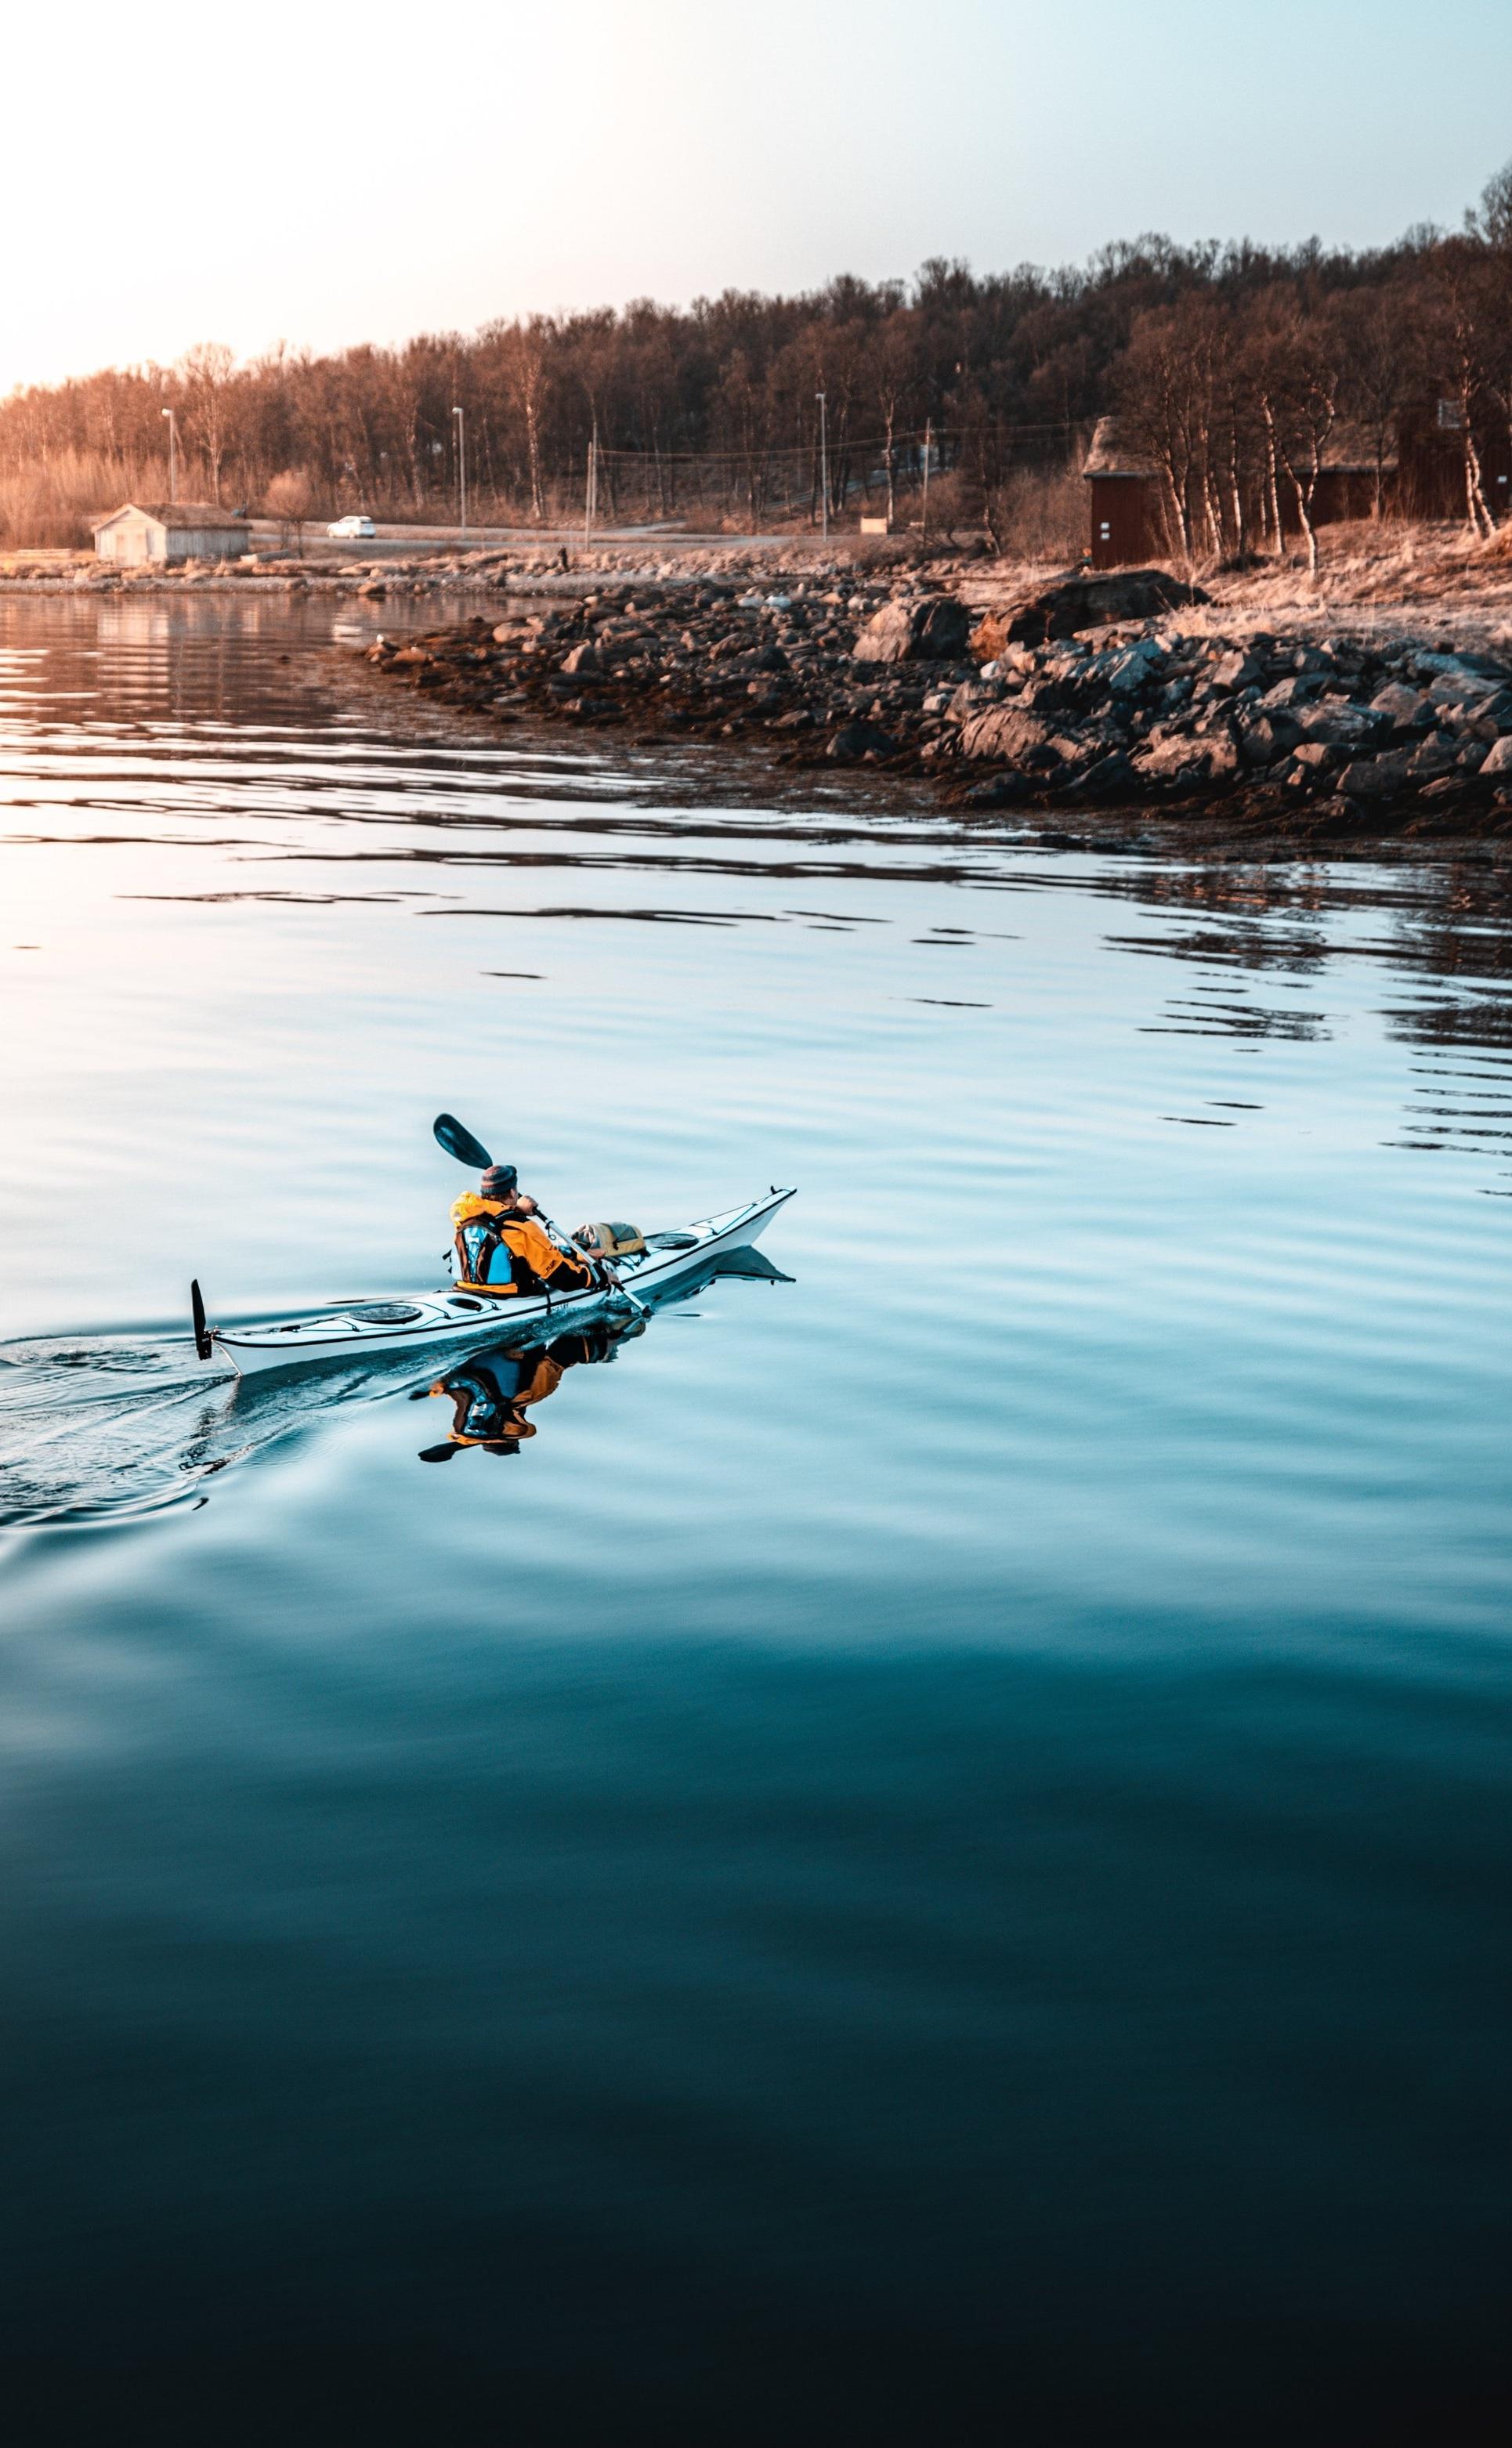 adventure-boat-calm-2230444.jpg